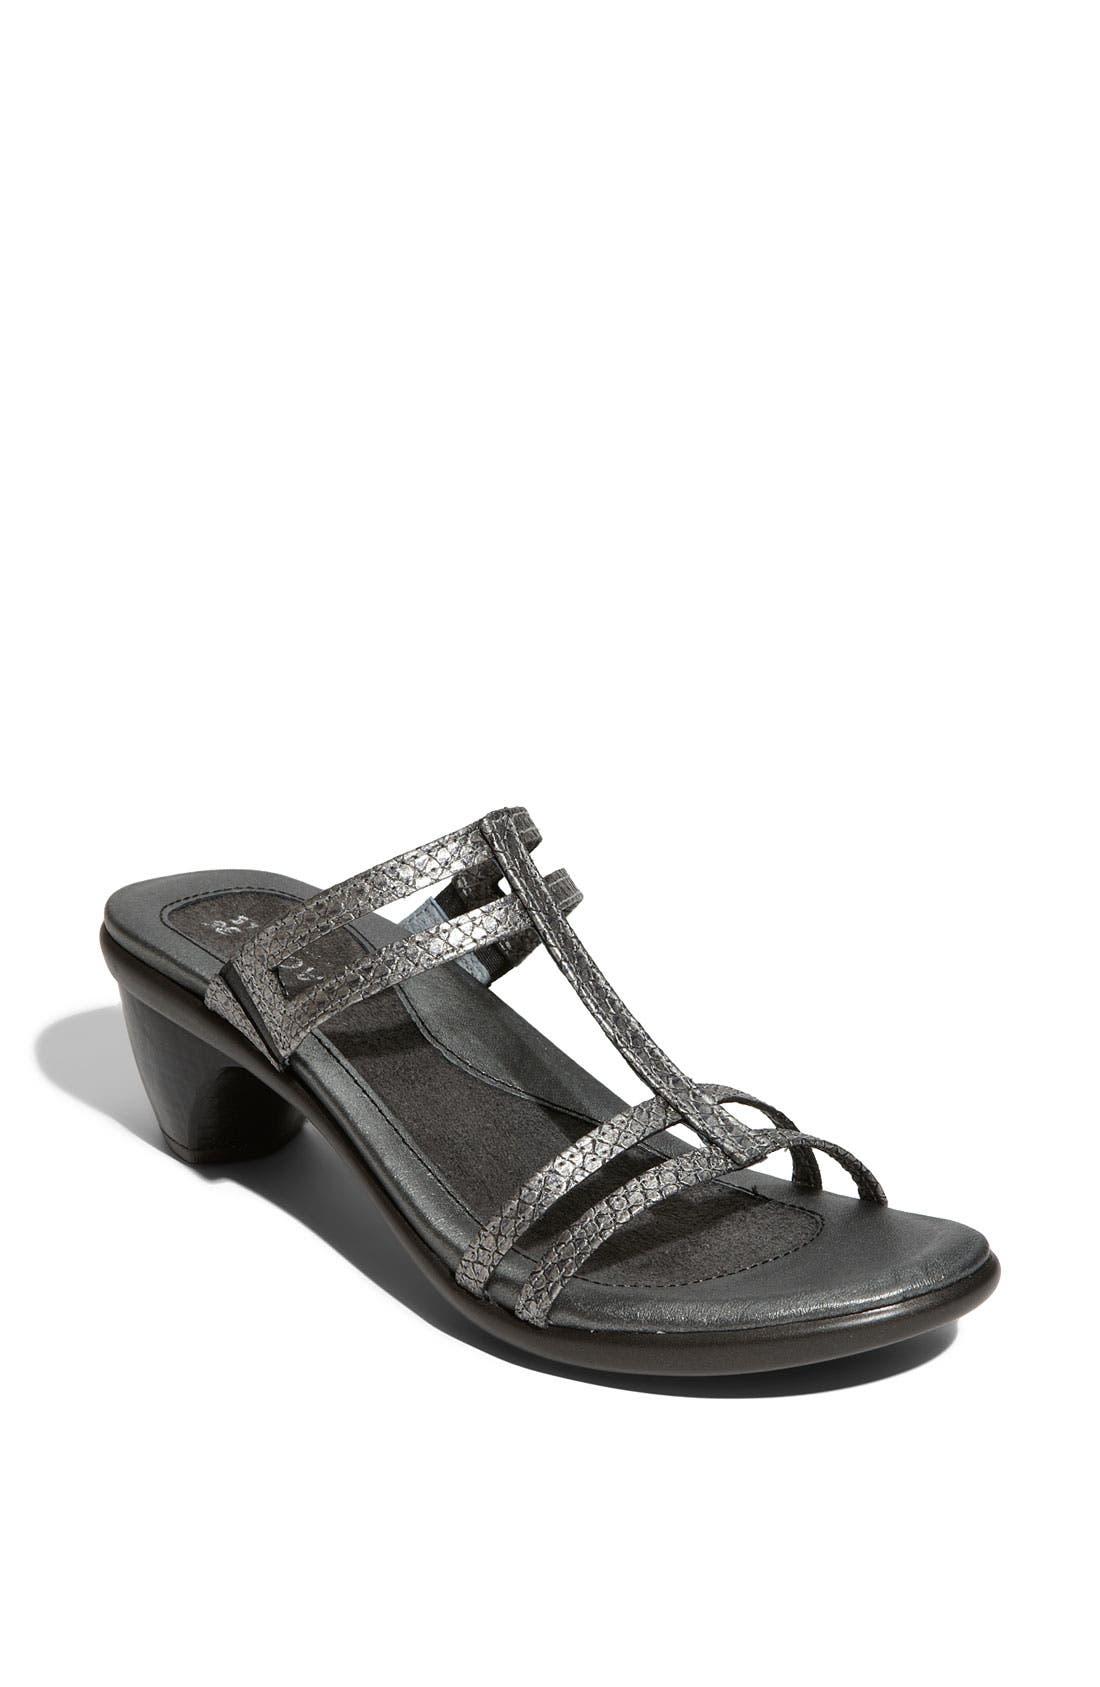 Alternate Image 1 Selected - Naot 'Loop' Sandal